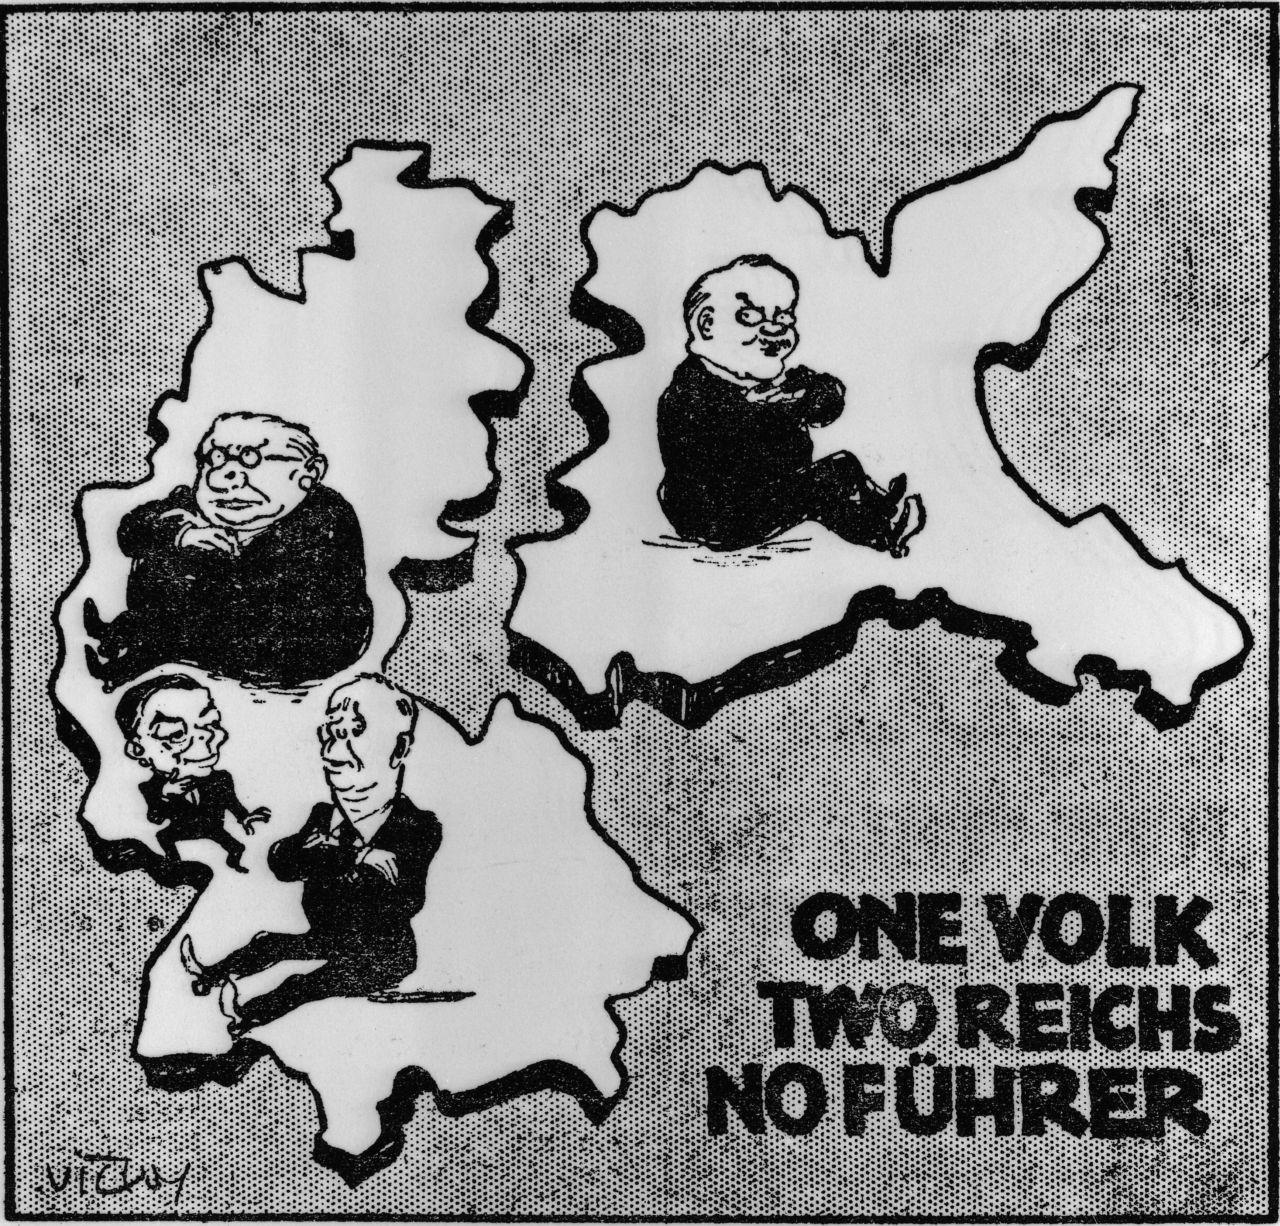 Besatzungszonen karikatur Category:Maps of